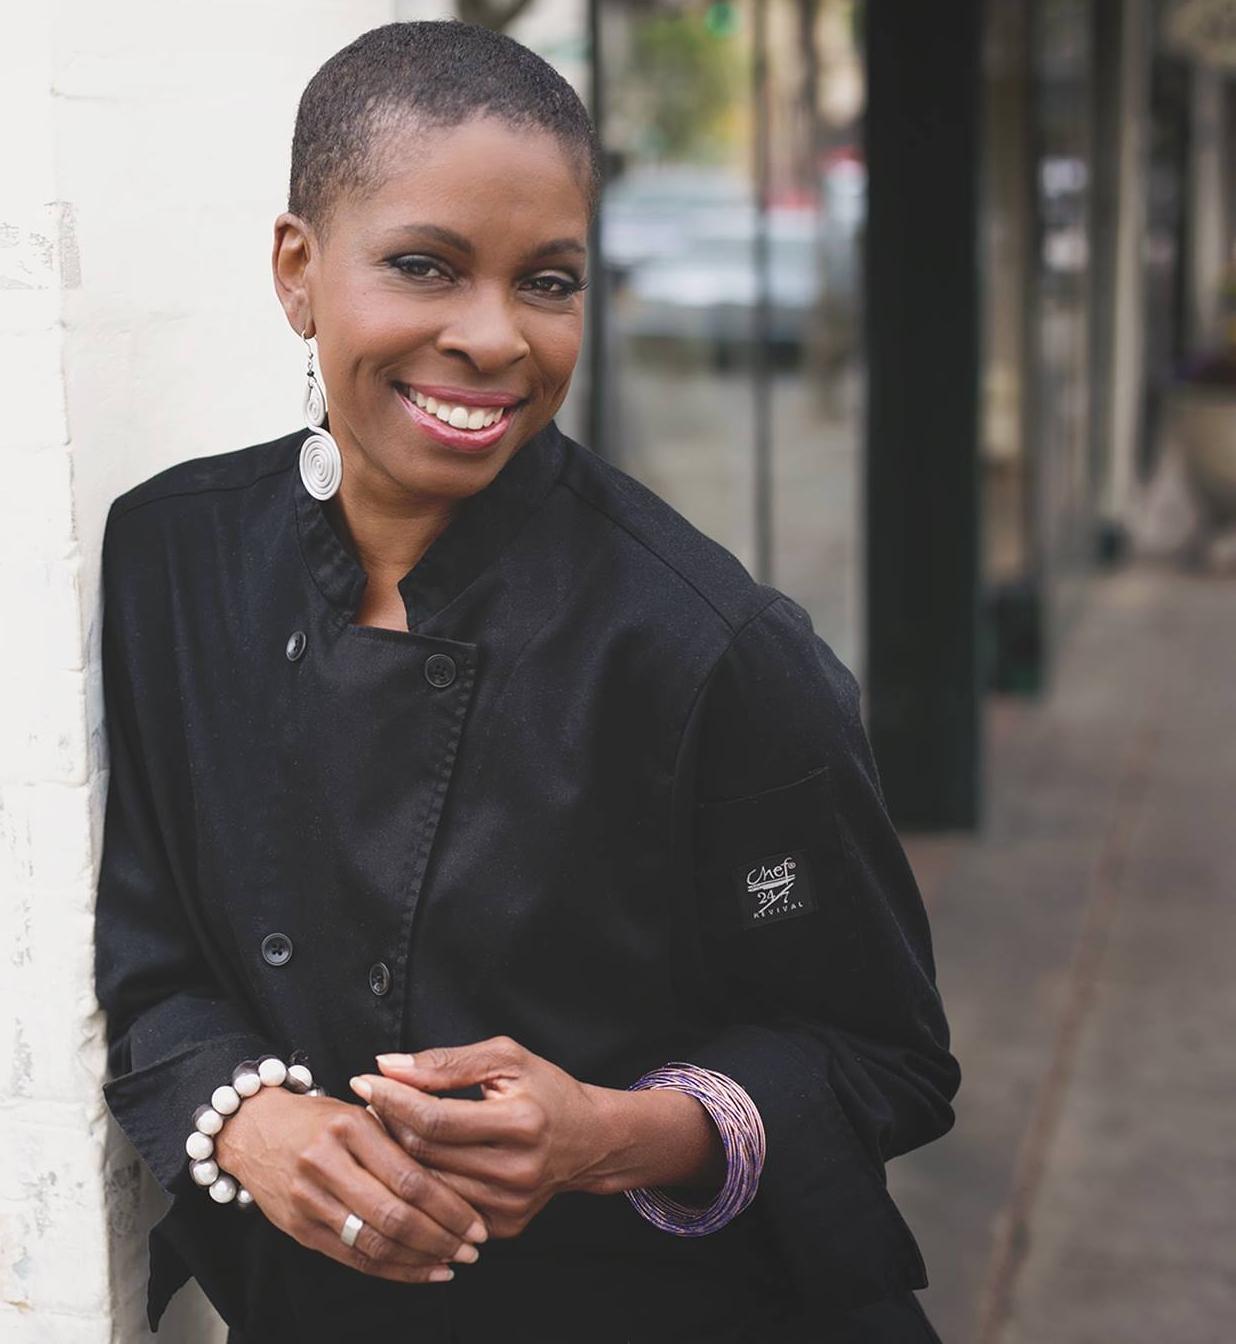 Chef Hunia Bradley - Owner